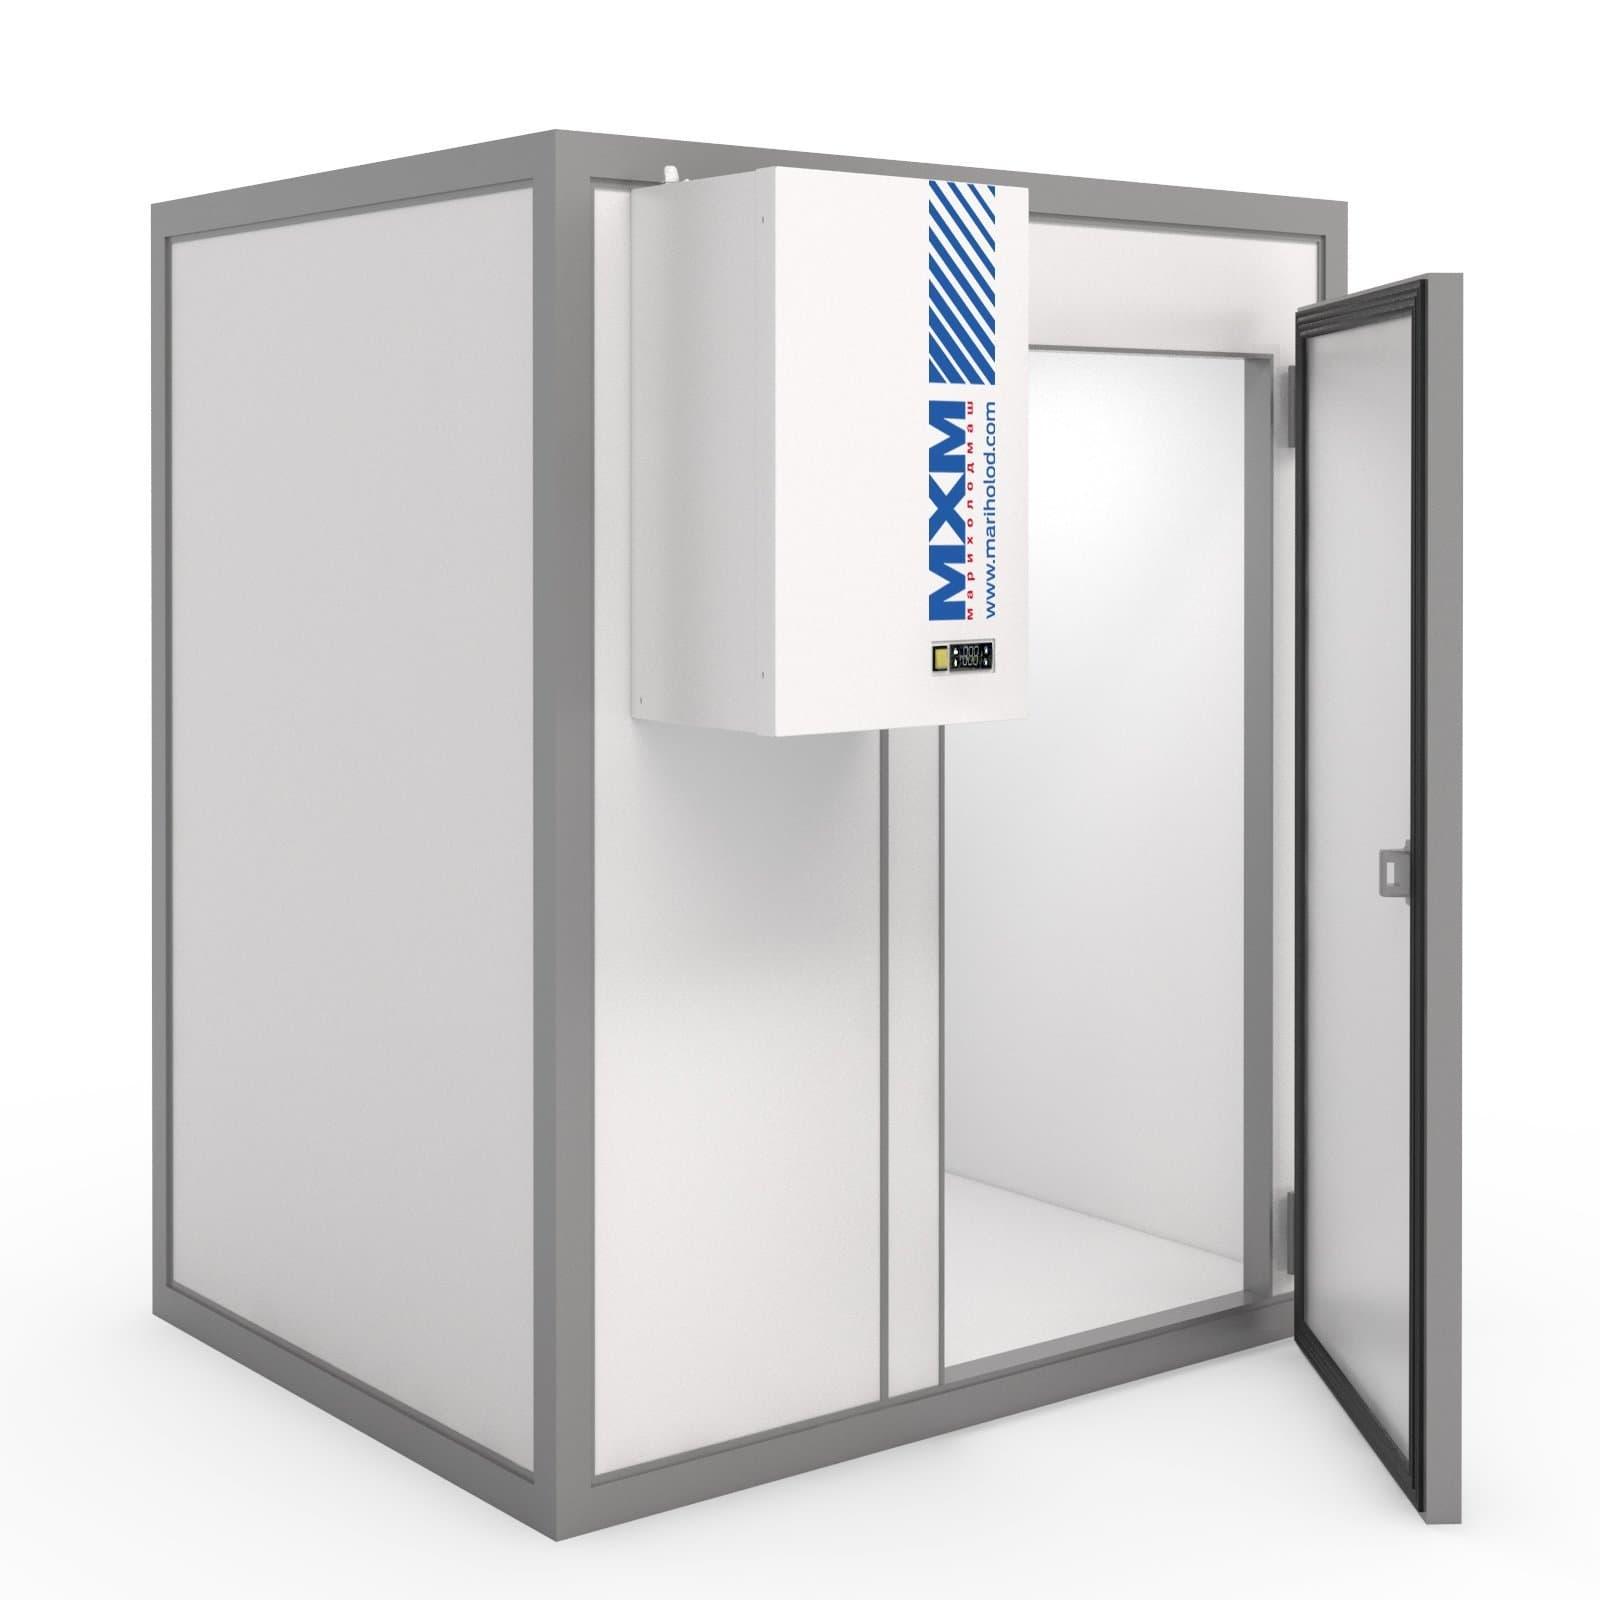 Камера холодильная МХМ КХН-19,67 1660×5860×2460